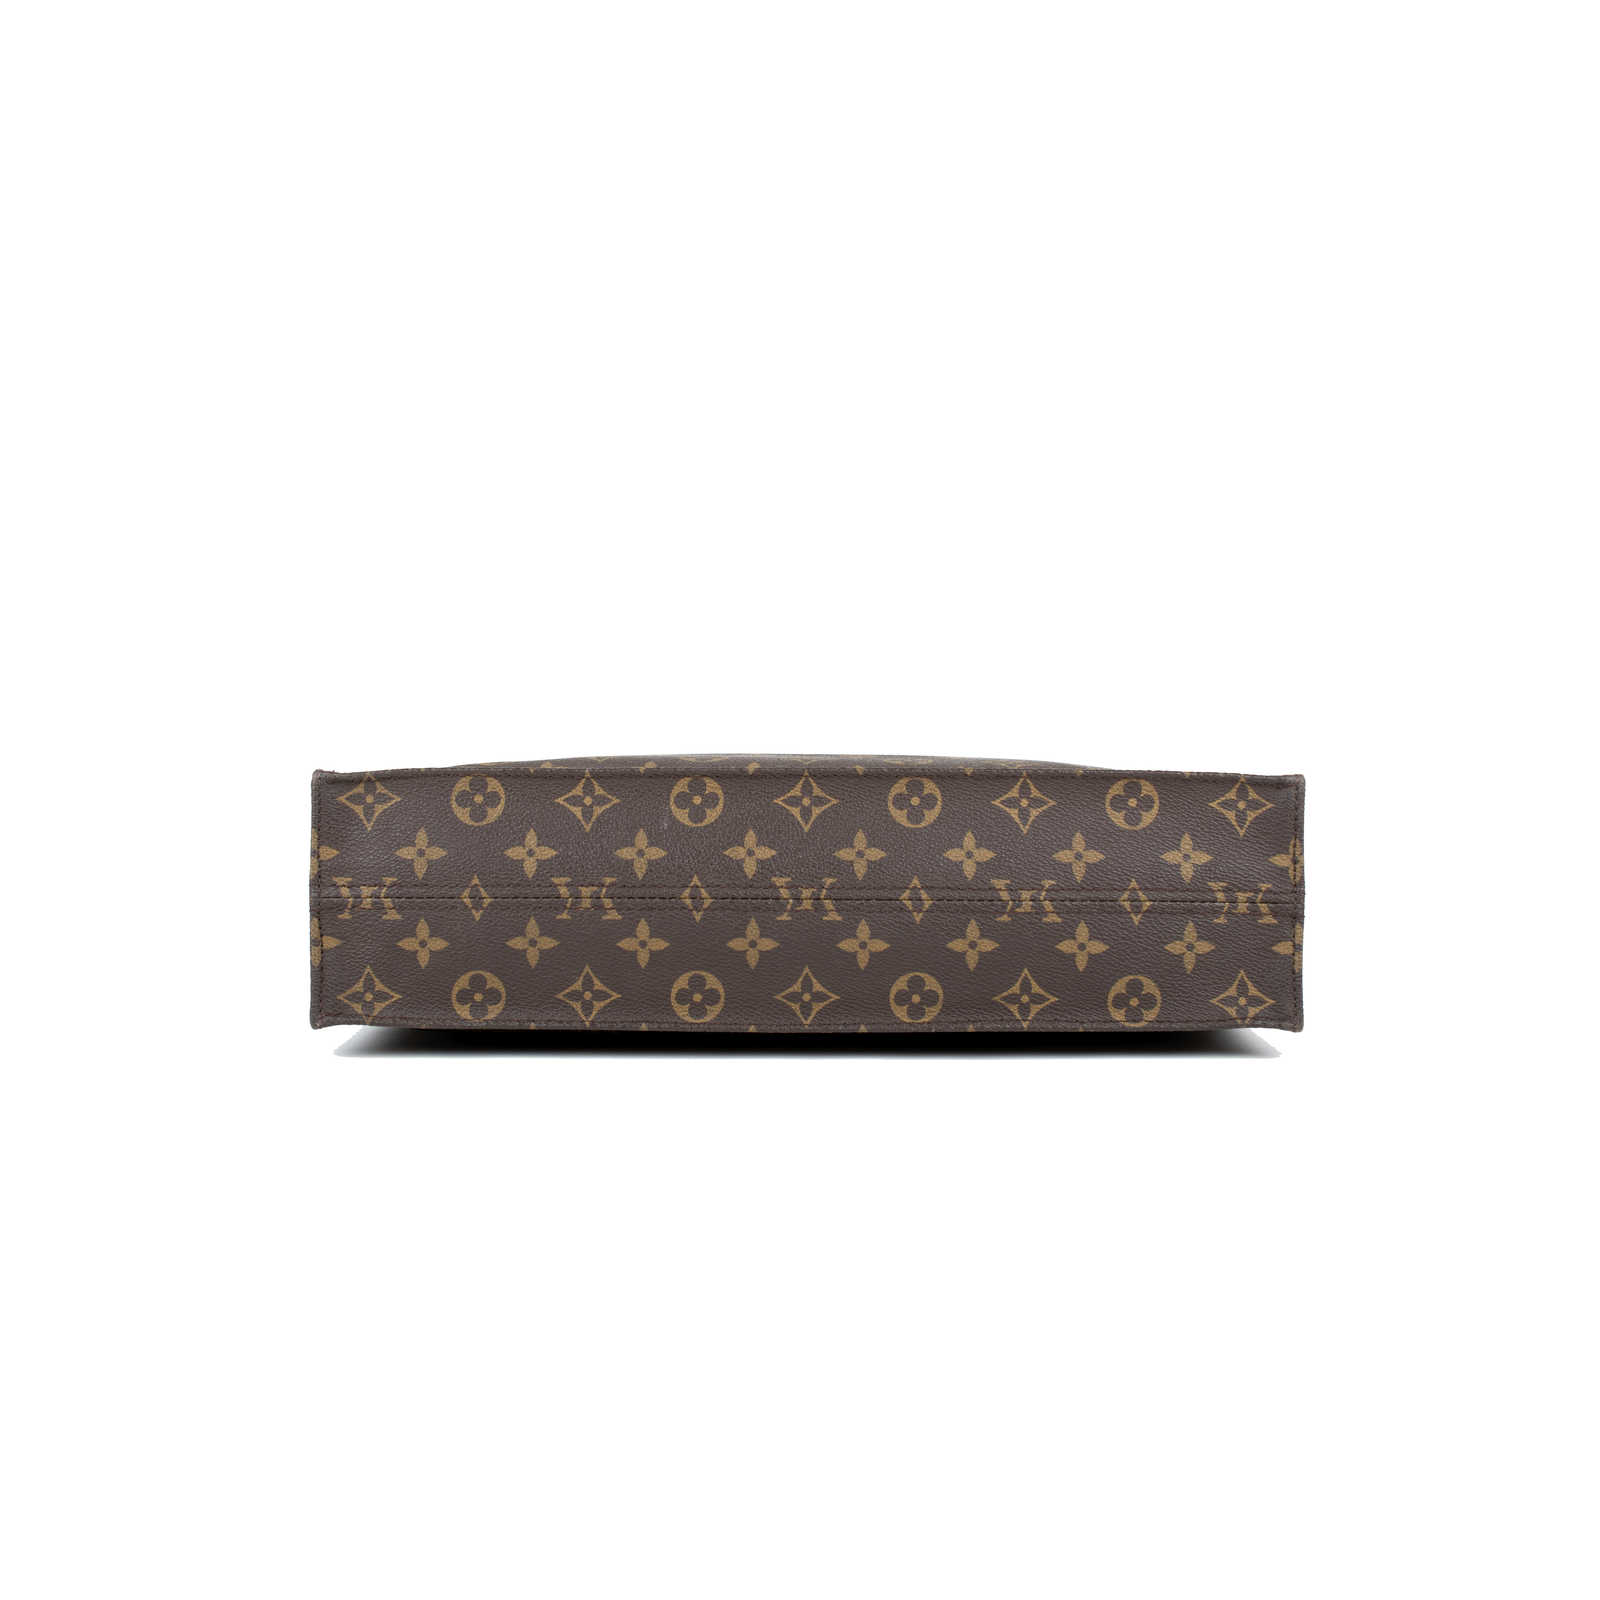 805eb5c5adad ... Authentic Second Hand Louis Vuitton Monogram Sac Plat Tote Bag  (PSS-430-00002 ...